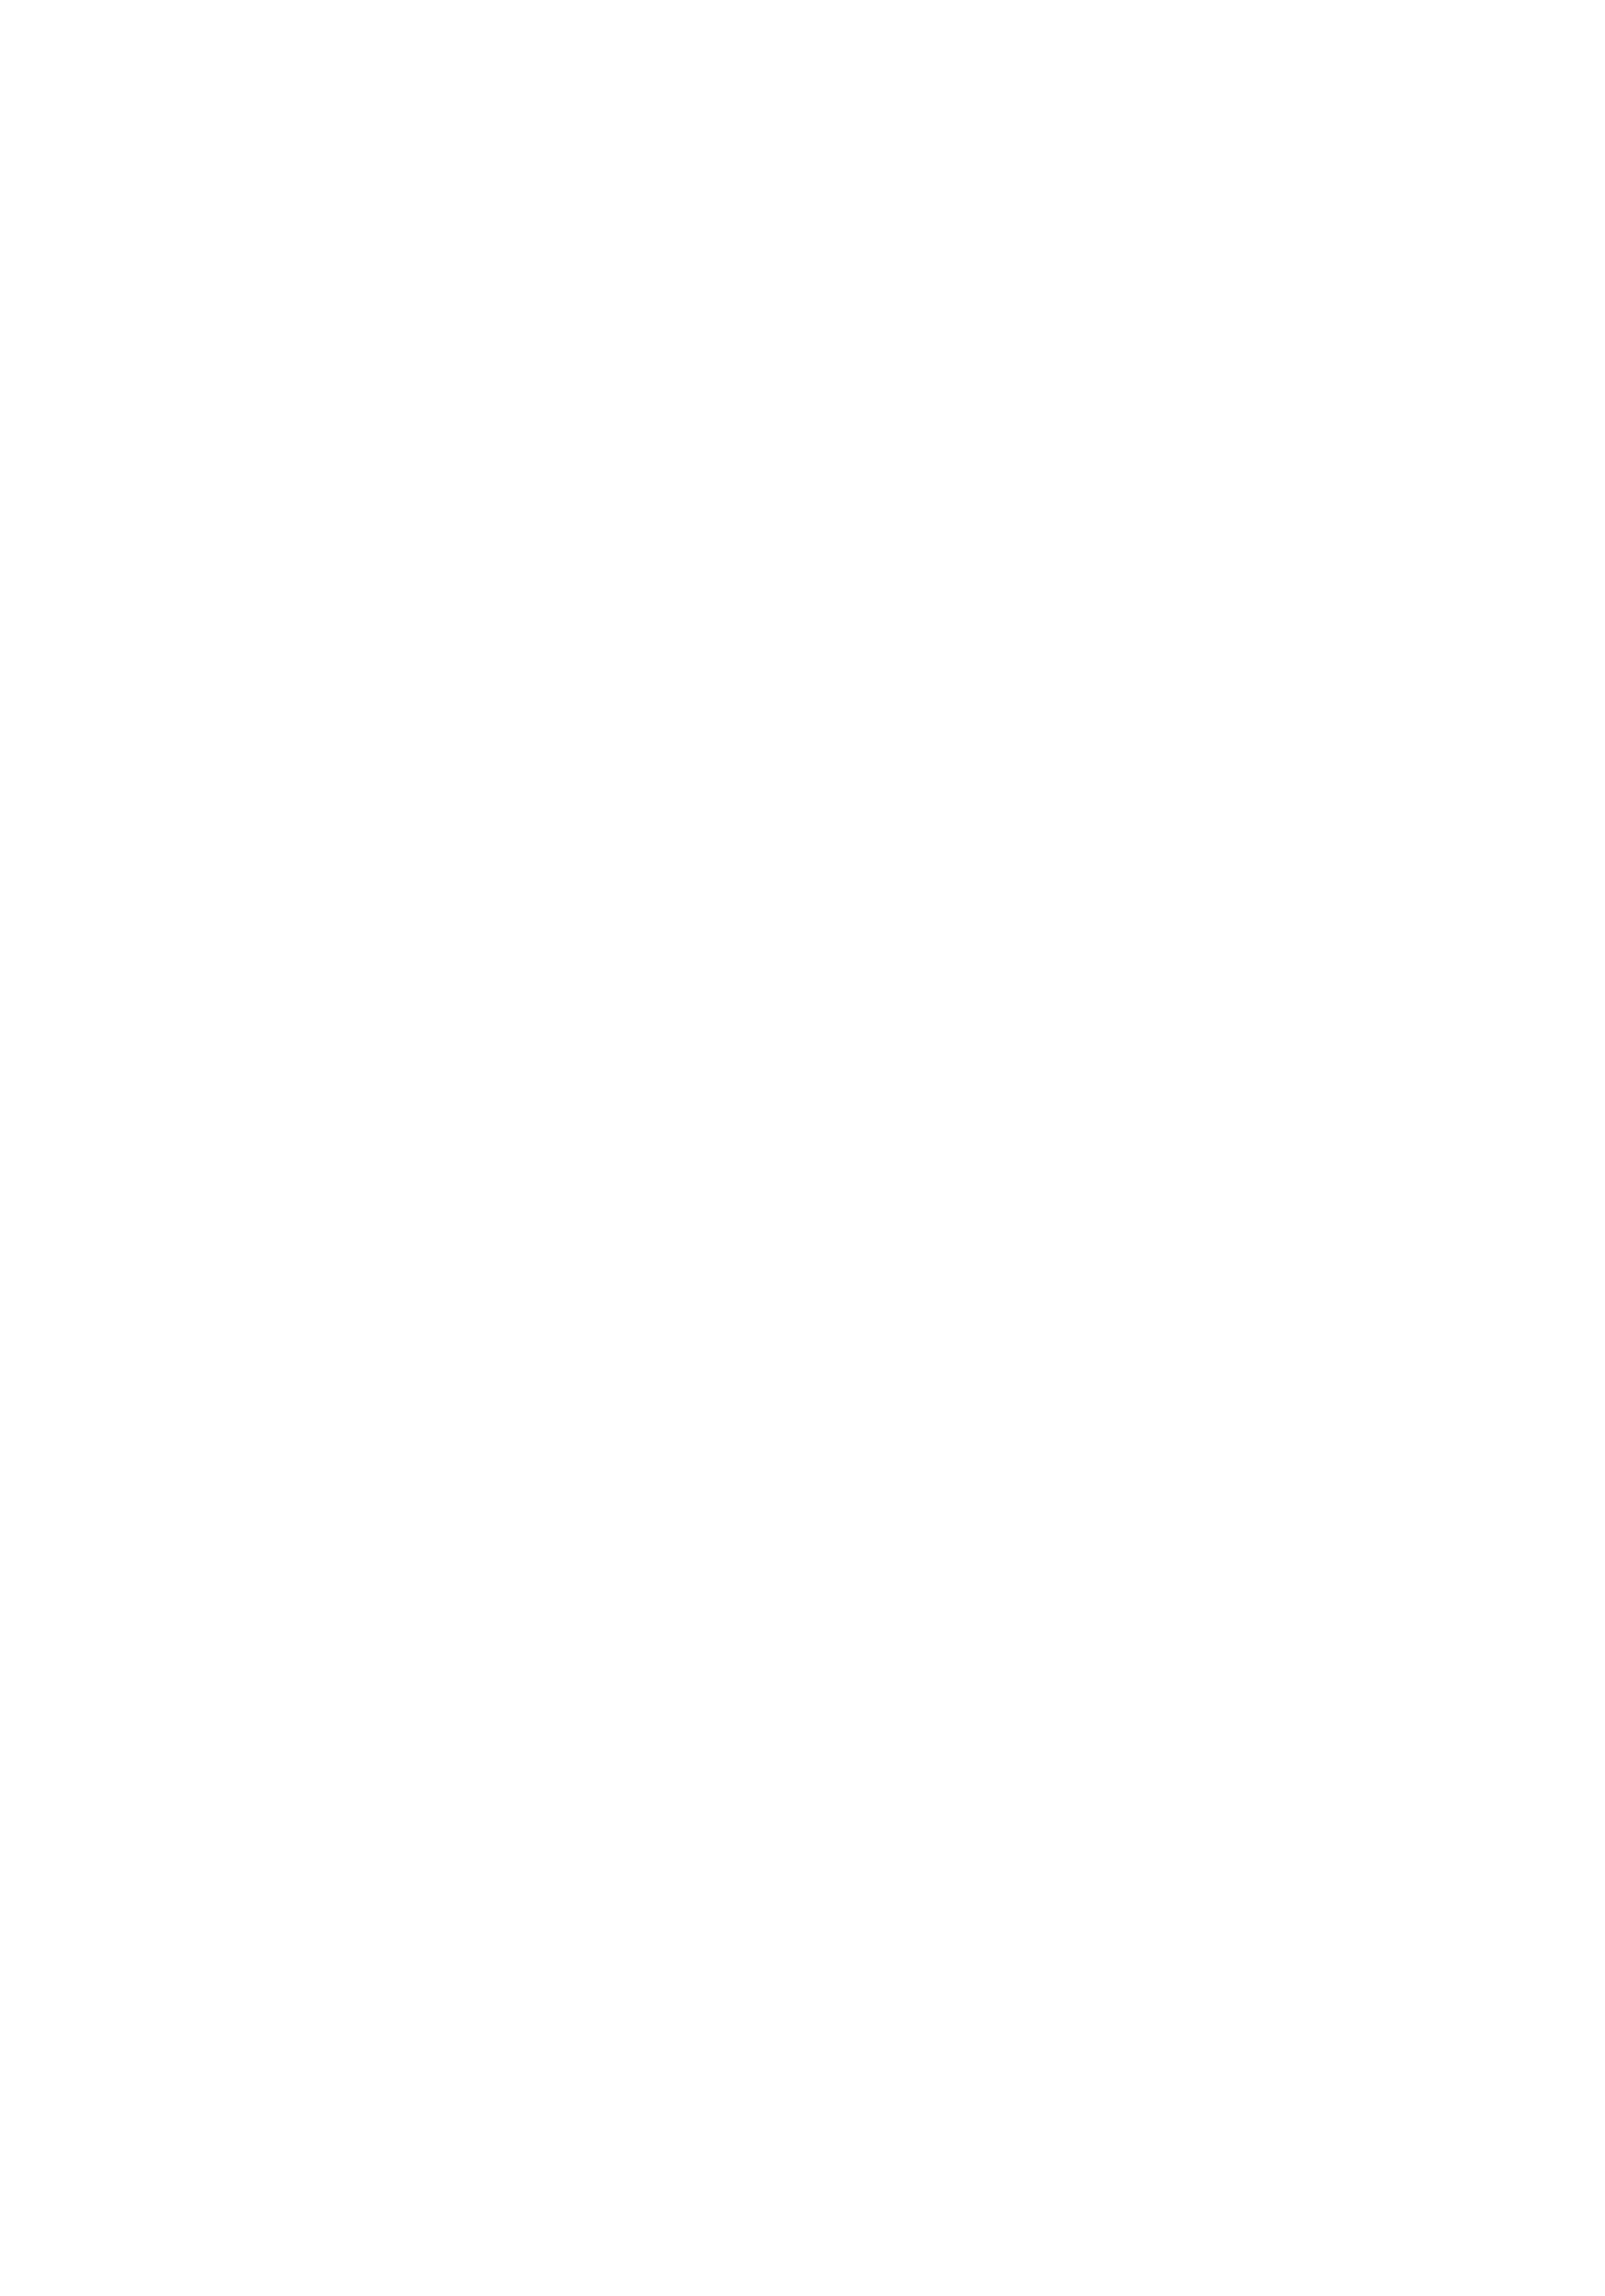 icone 13